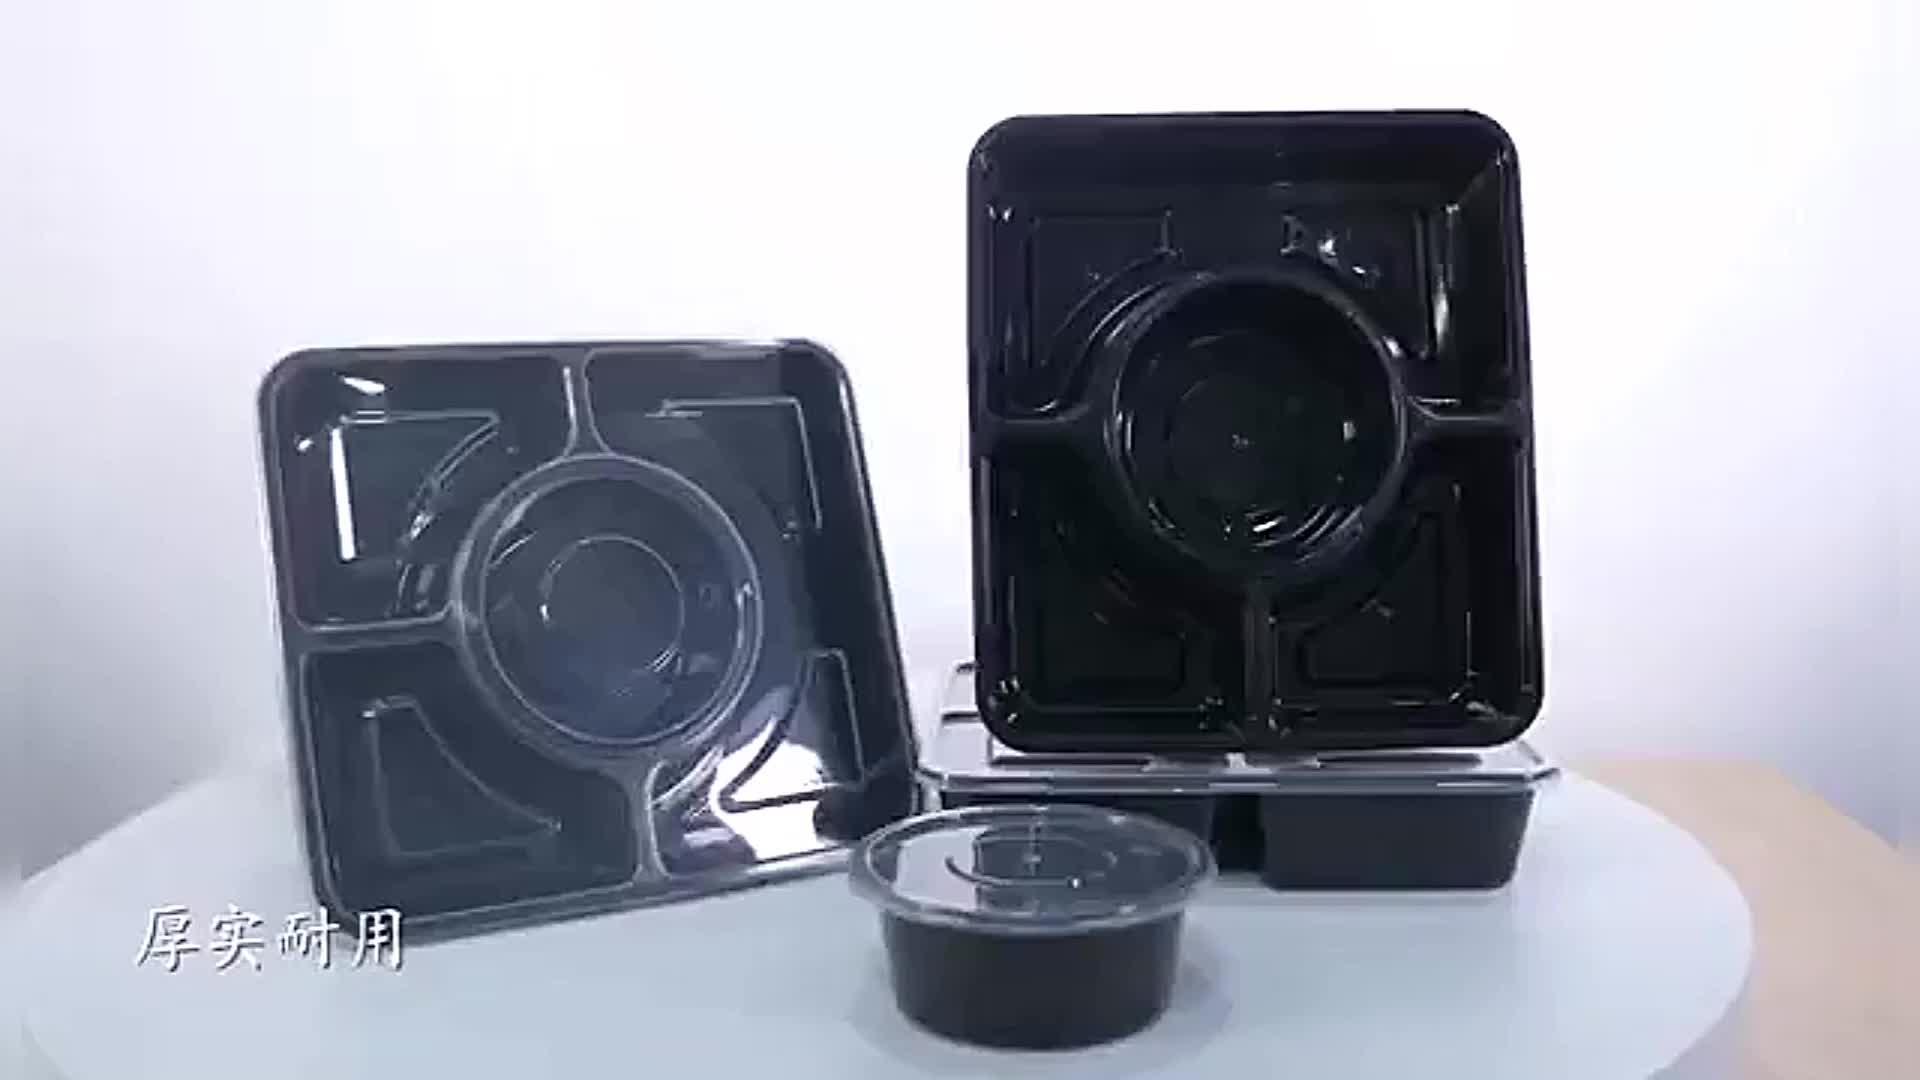 Caixa de Take-out compartimento recipiente de alimento descartável de plástico transparente para o restaurante